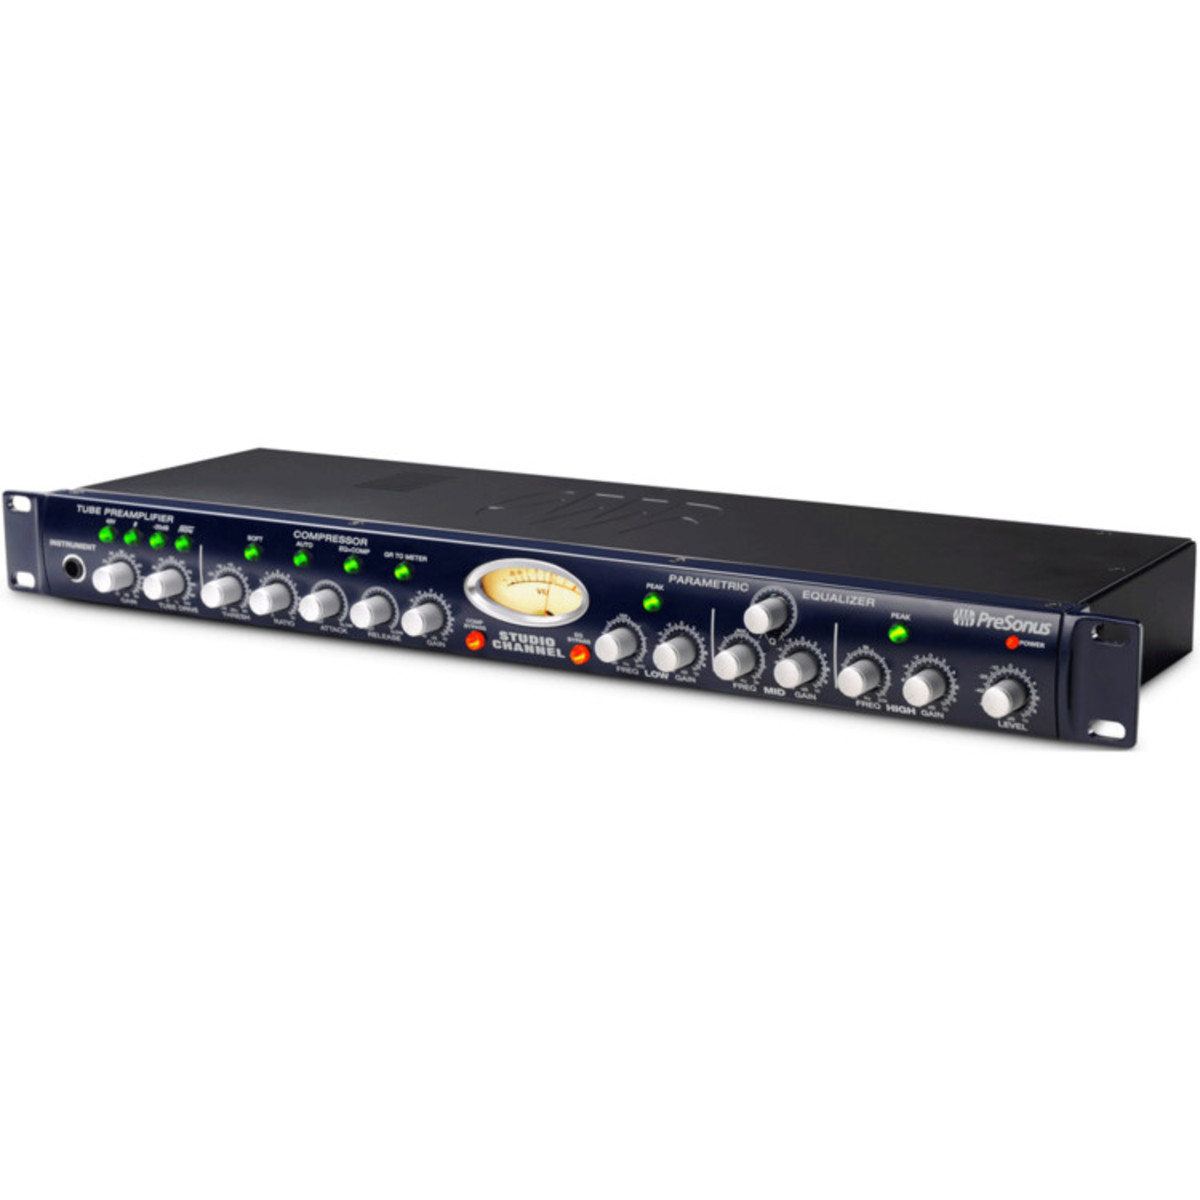 Presonus Studio Channel Mono Vacuum Tube Preamp Compressor Eq B Audio Vu Meter Circuit Loading Zoom